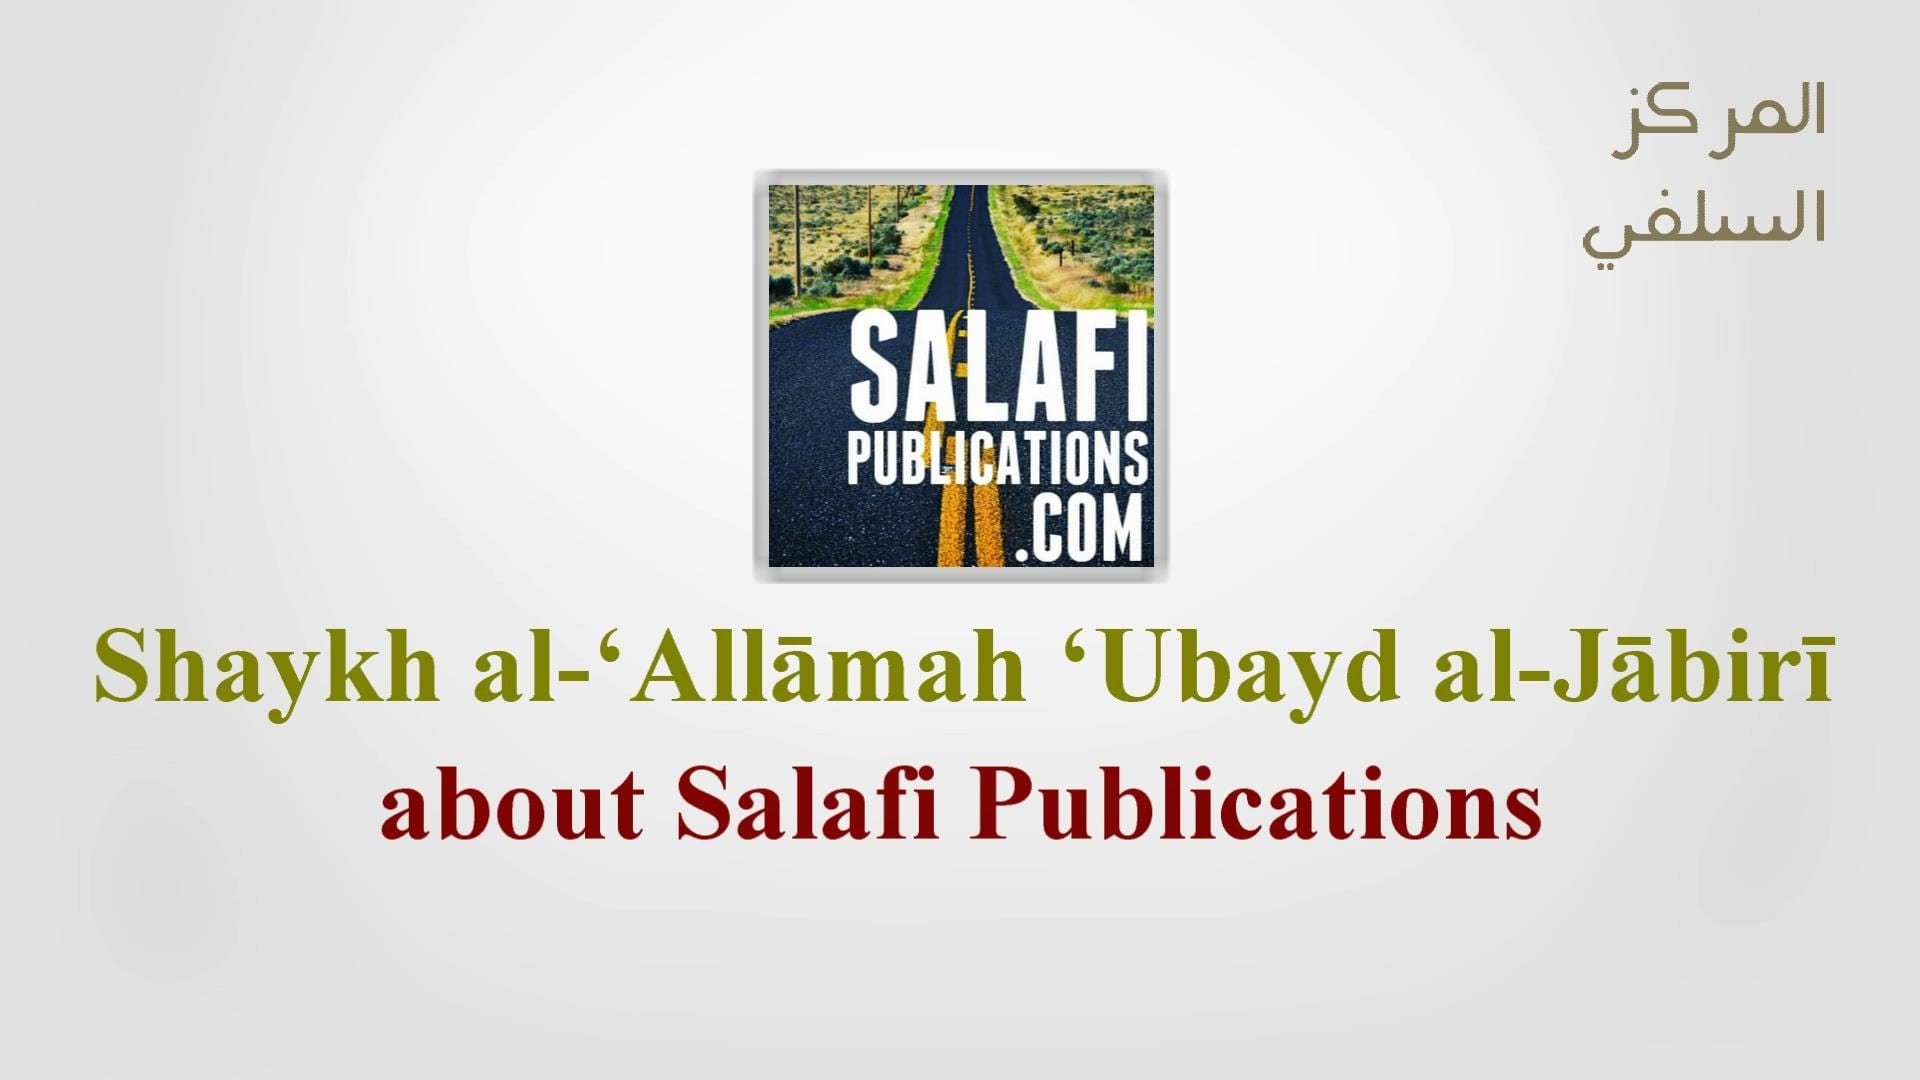 Shaykh 'Ubayd al-Jābirī about Salafi Publications